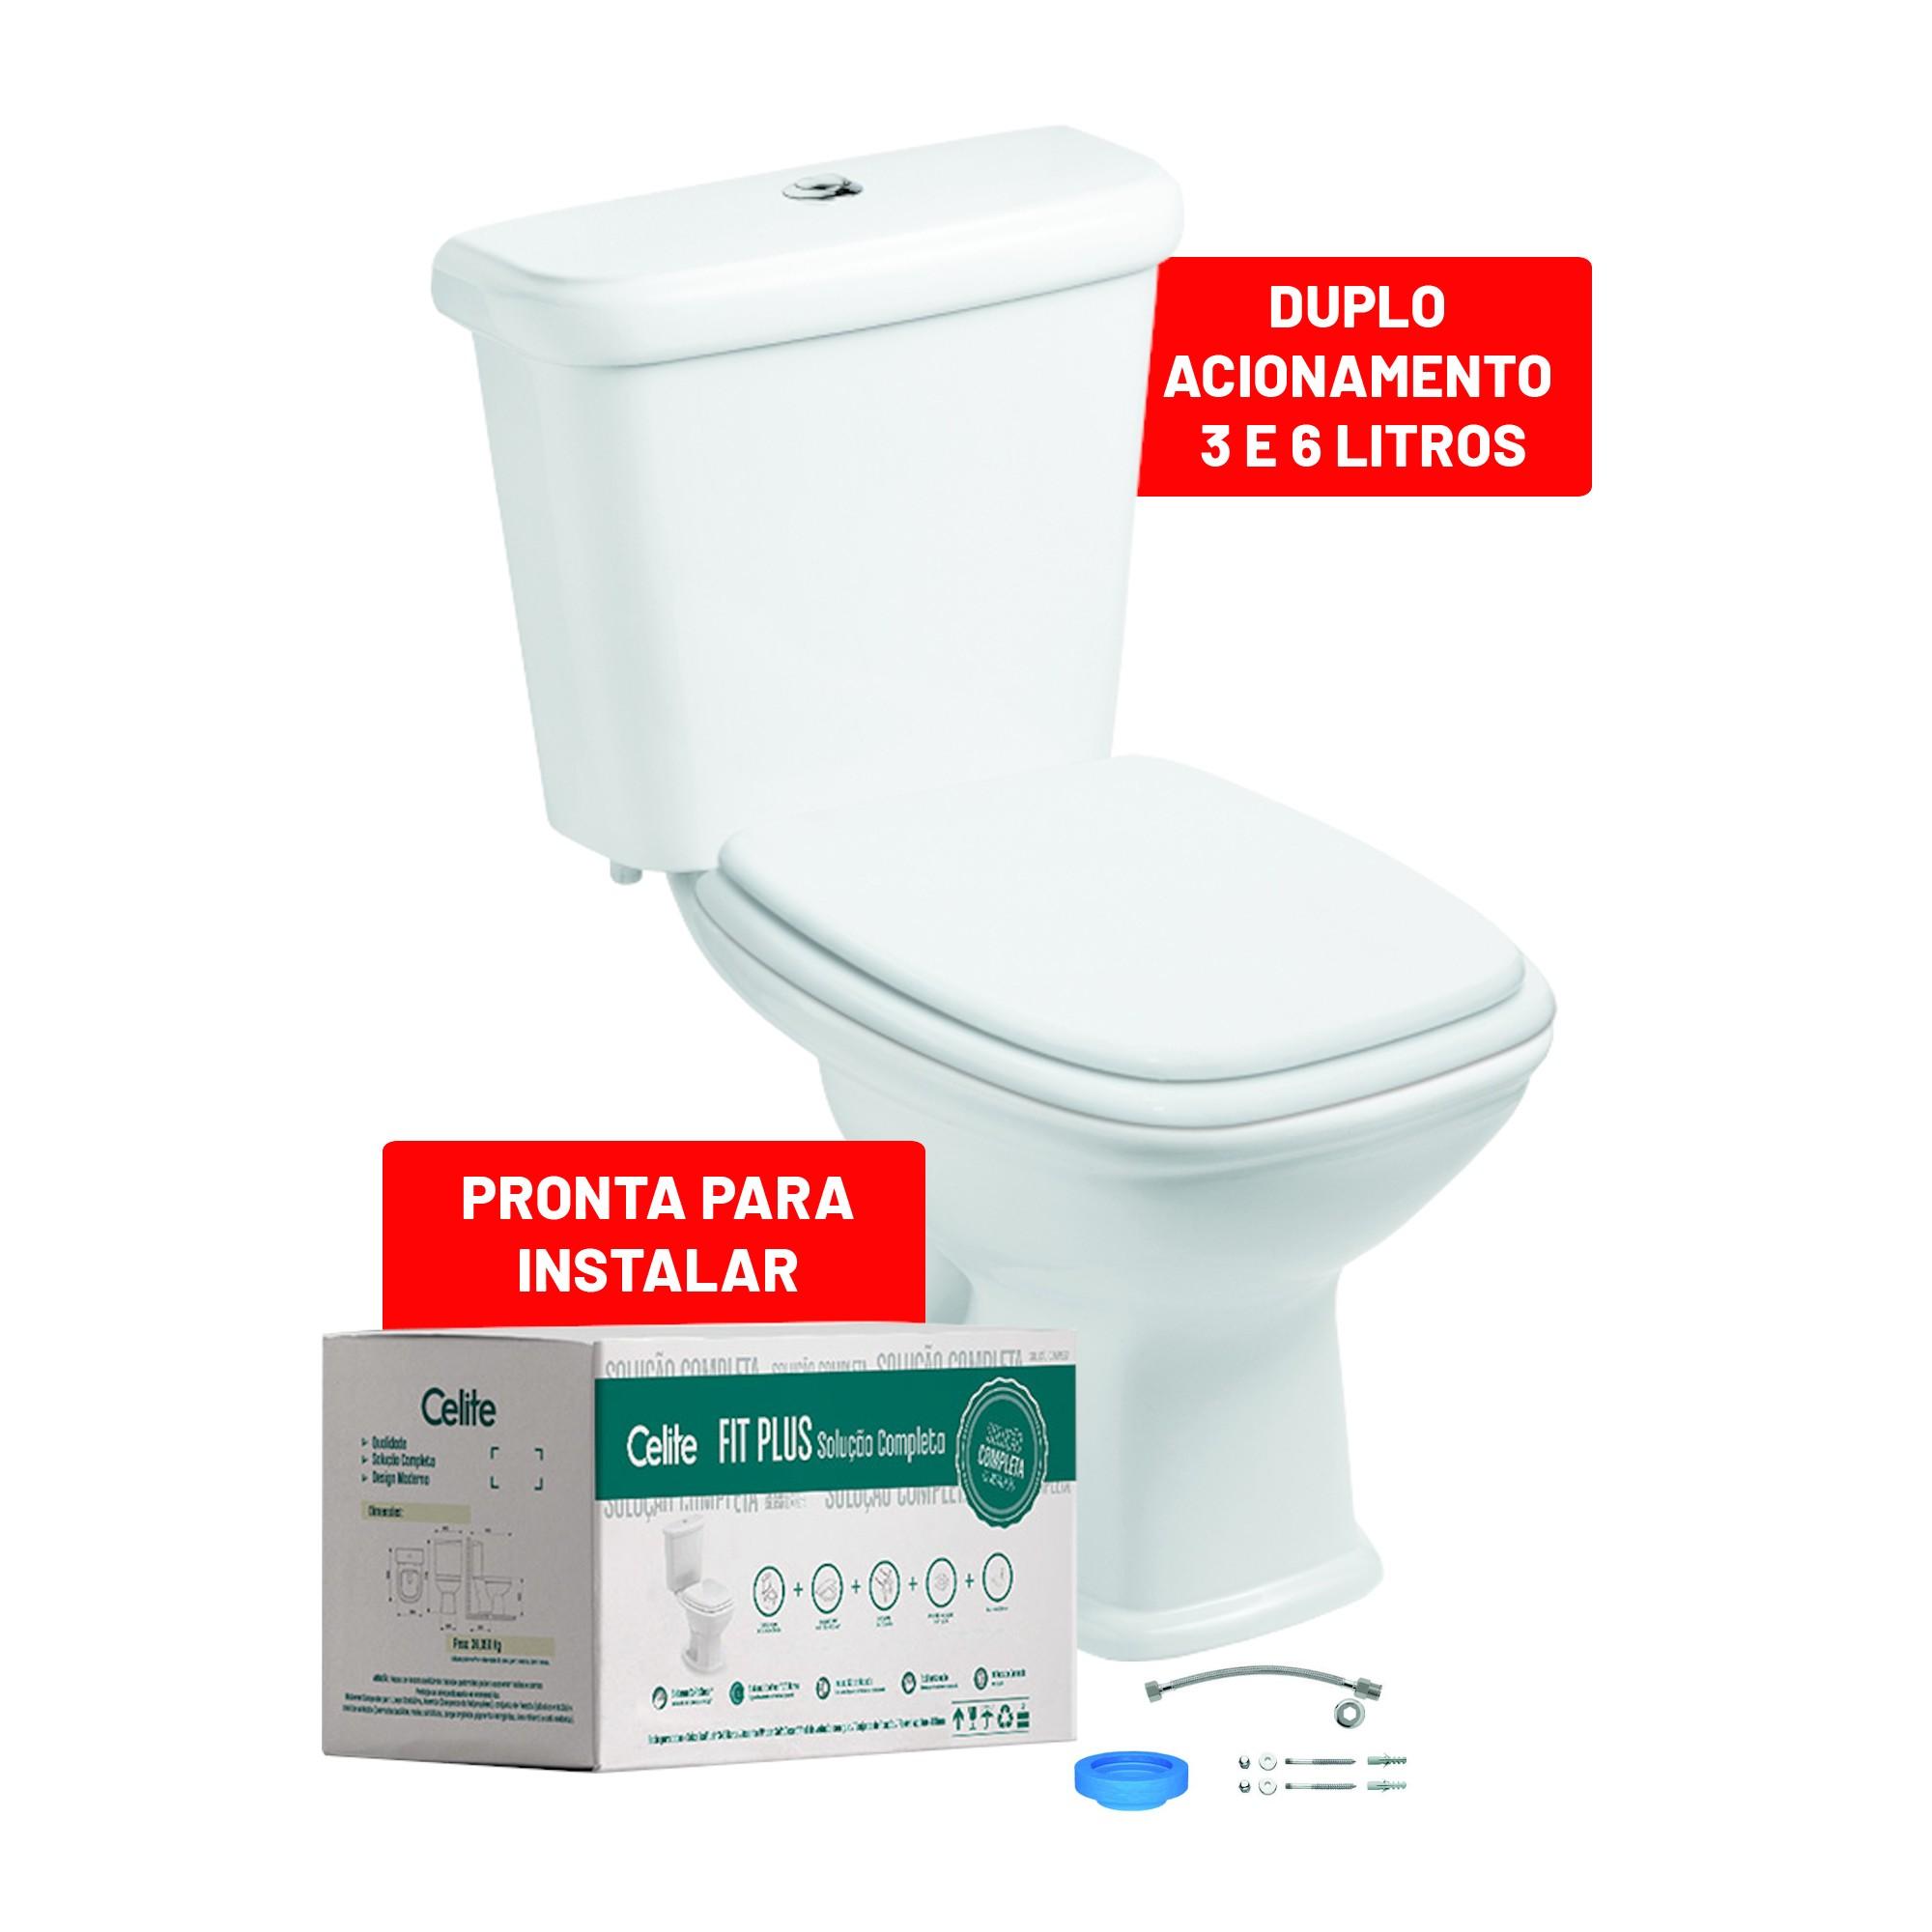 Kit Bacia Sanitaria com Caixa Acoplada Fit Plus 36 Litros - Celite